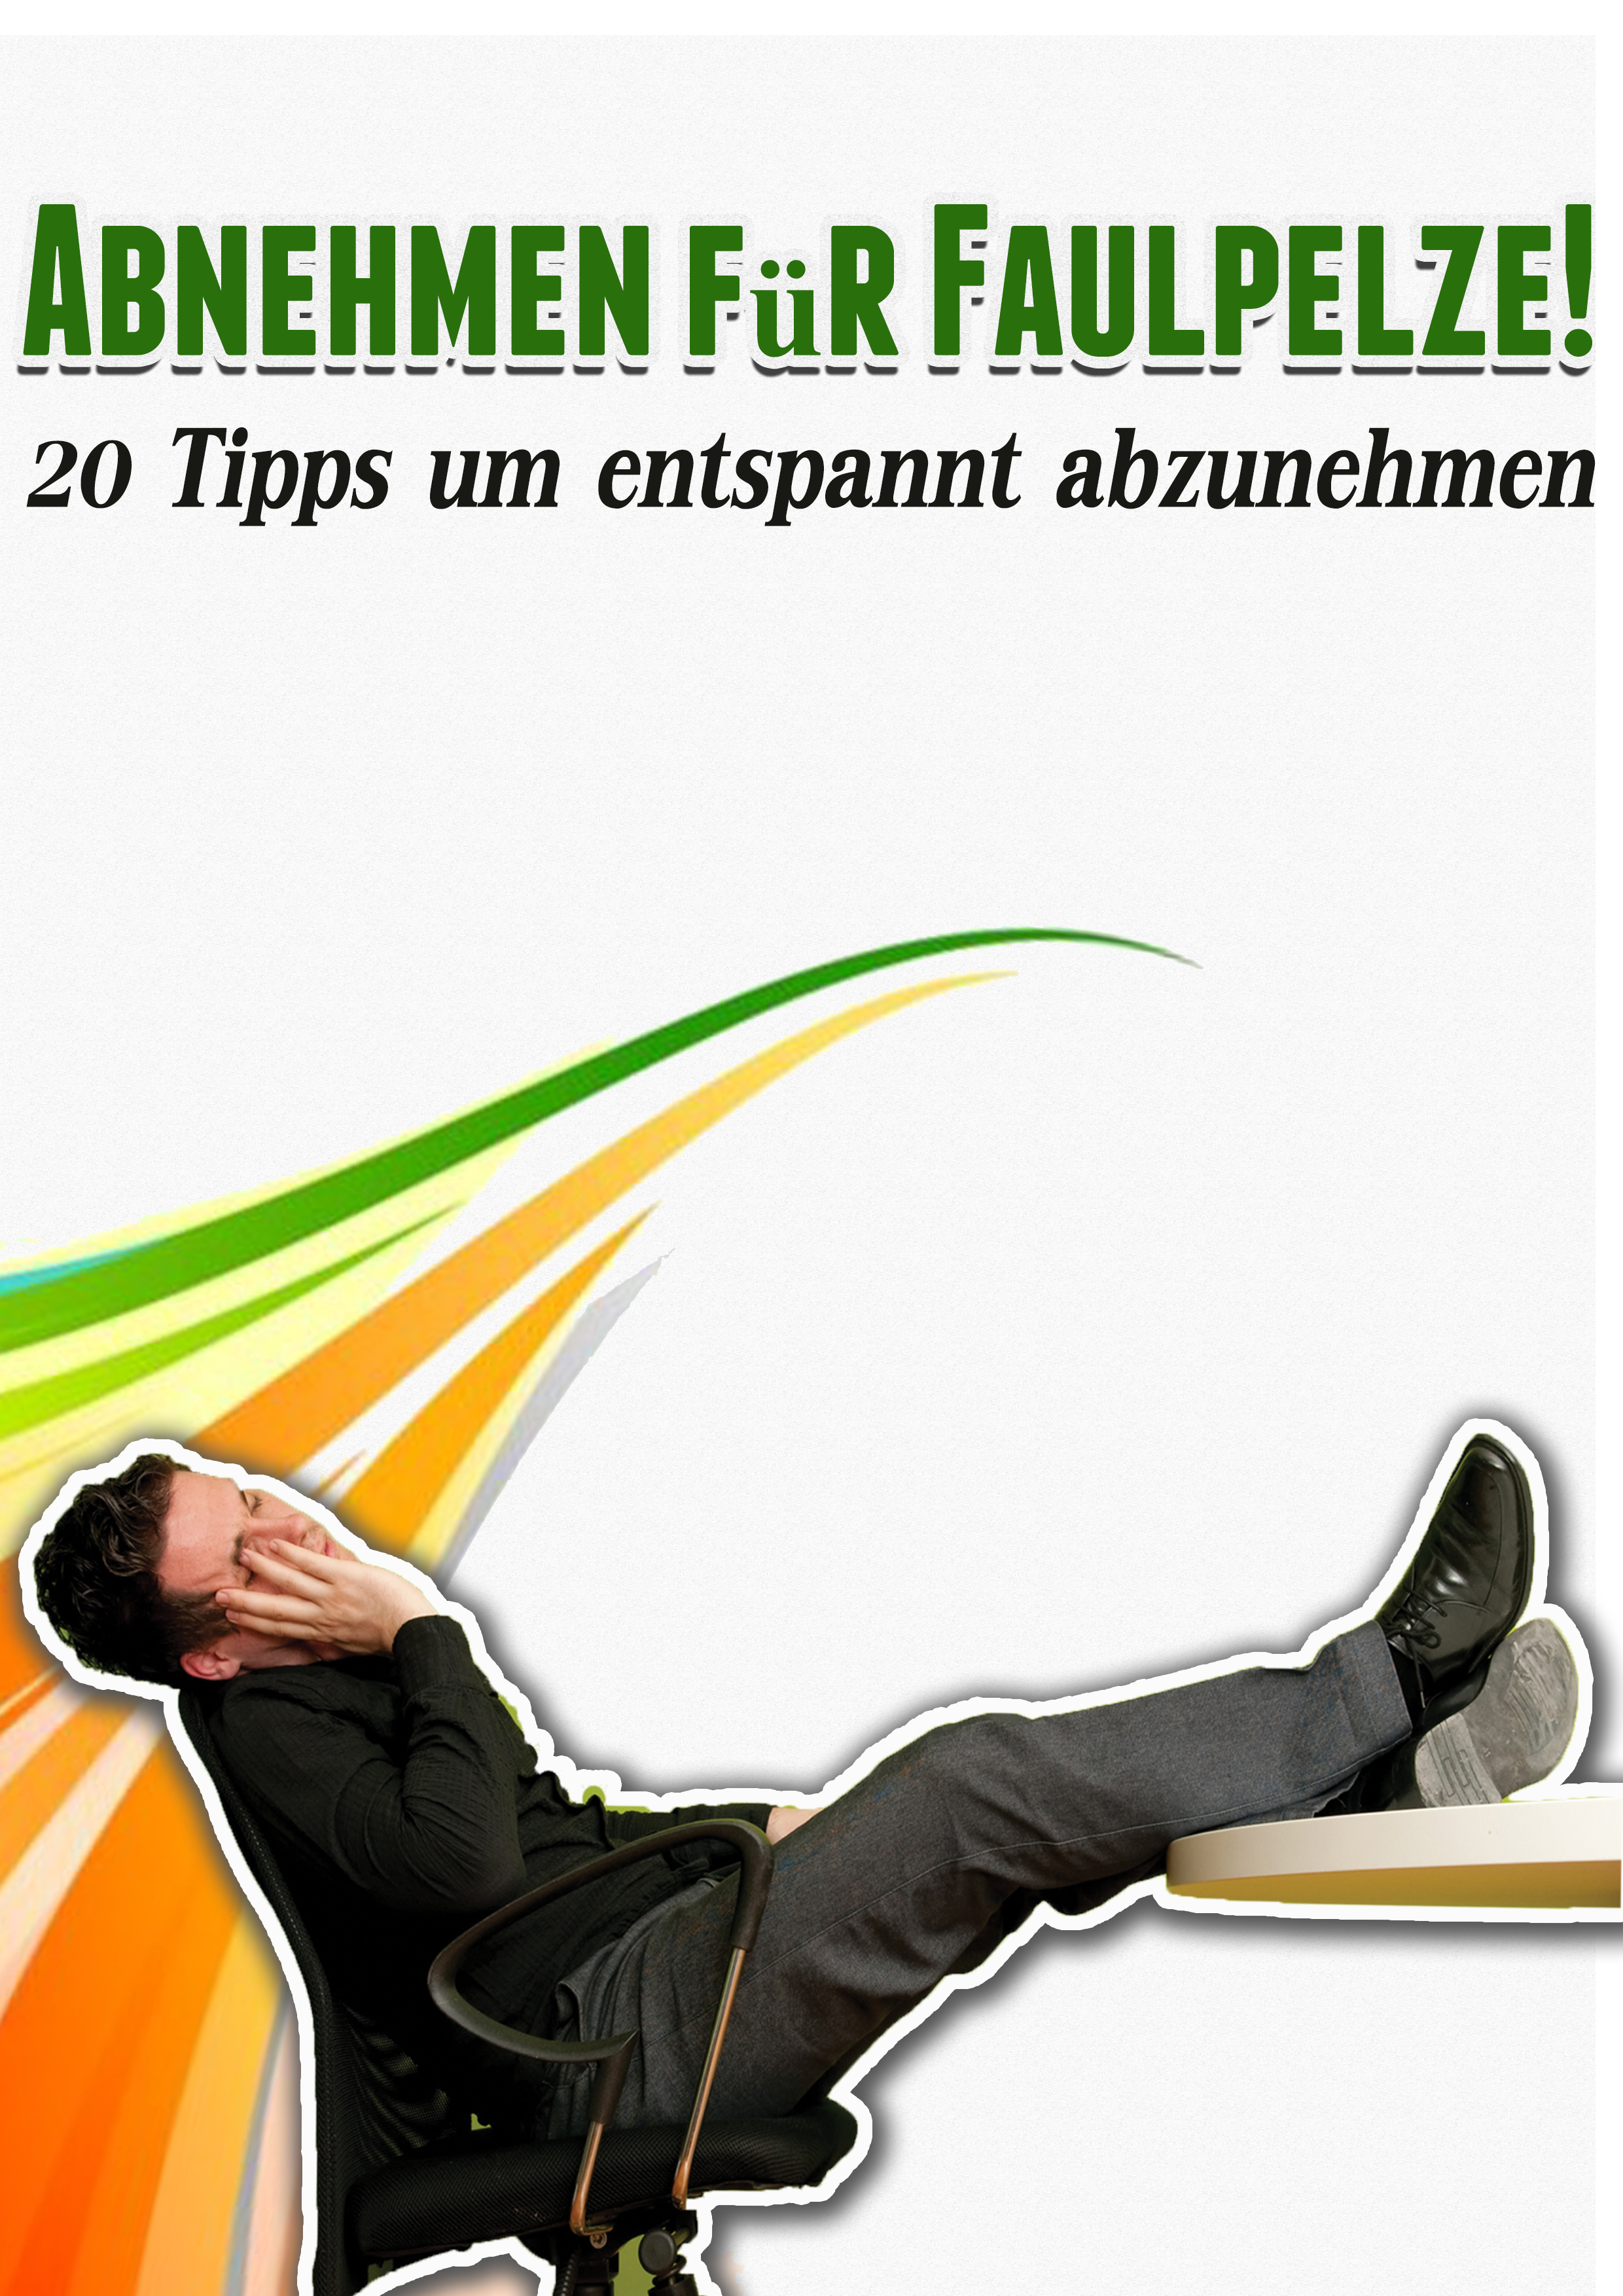 Jörg Janßen – Abnehmen für Faulpelze